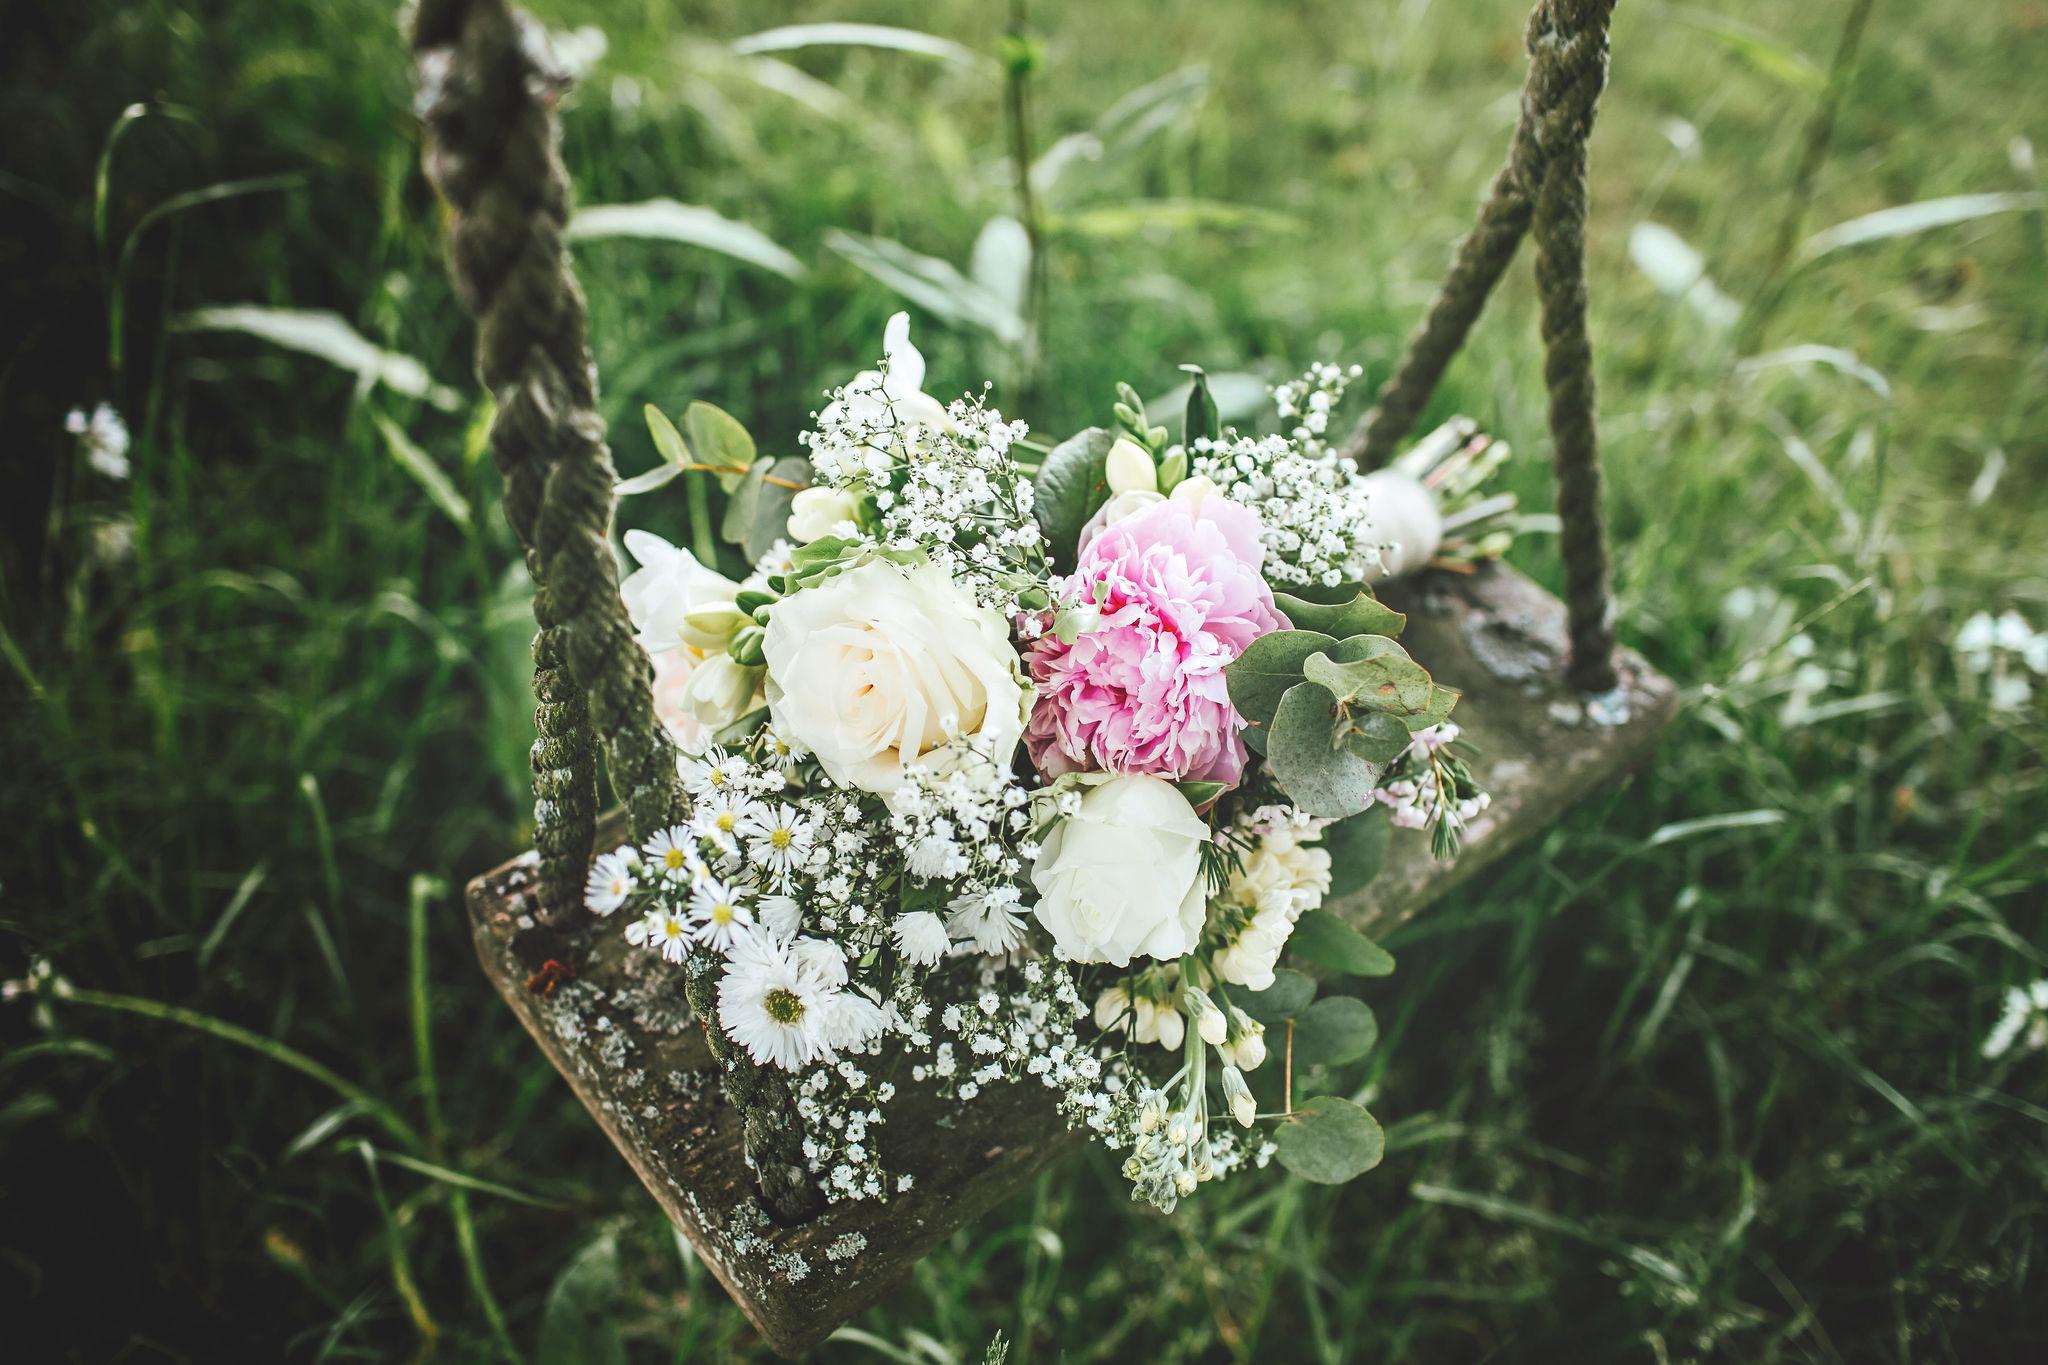 fiesta-fields-louisa-thomas-blog-bouquet-abigailwhite.jpg